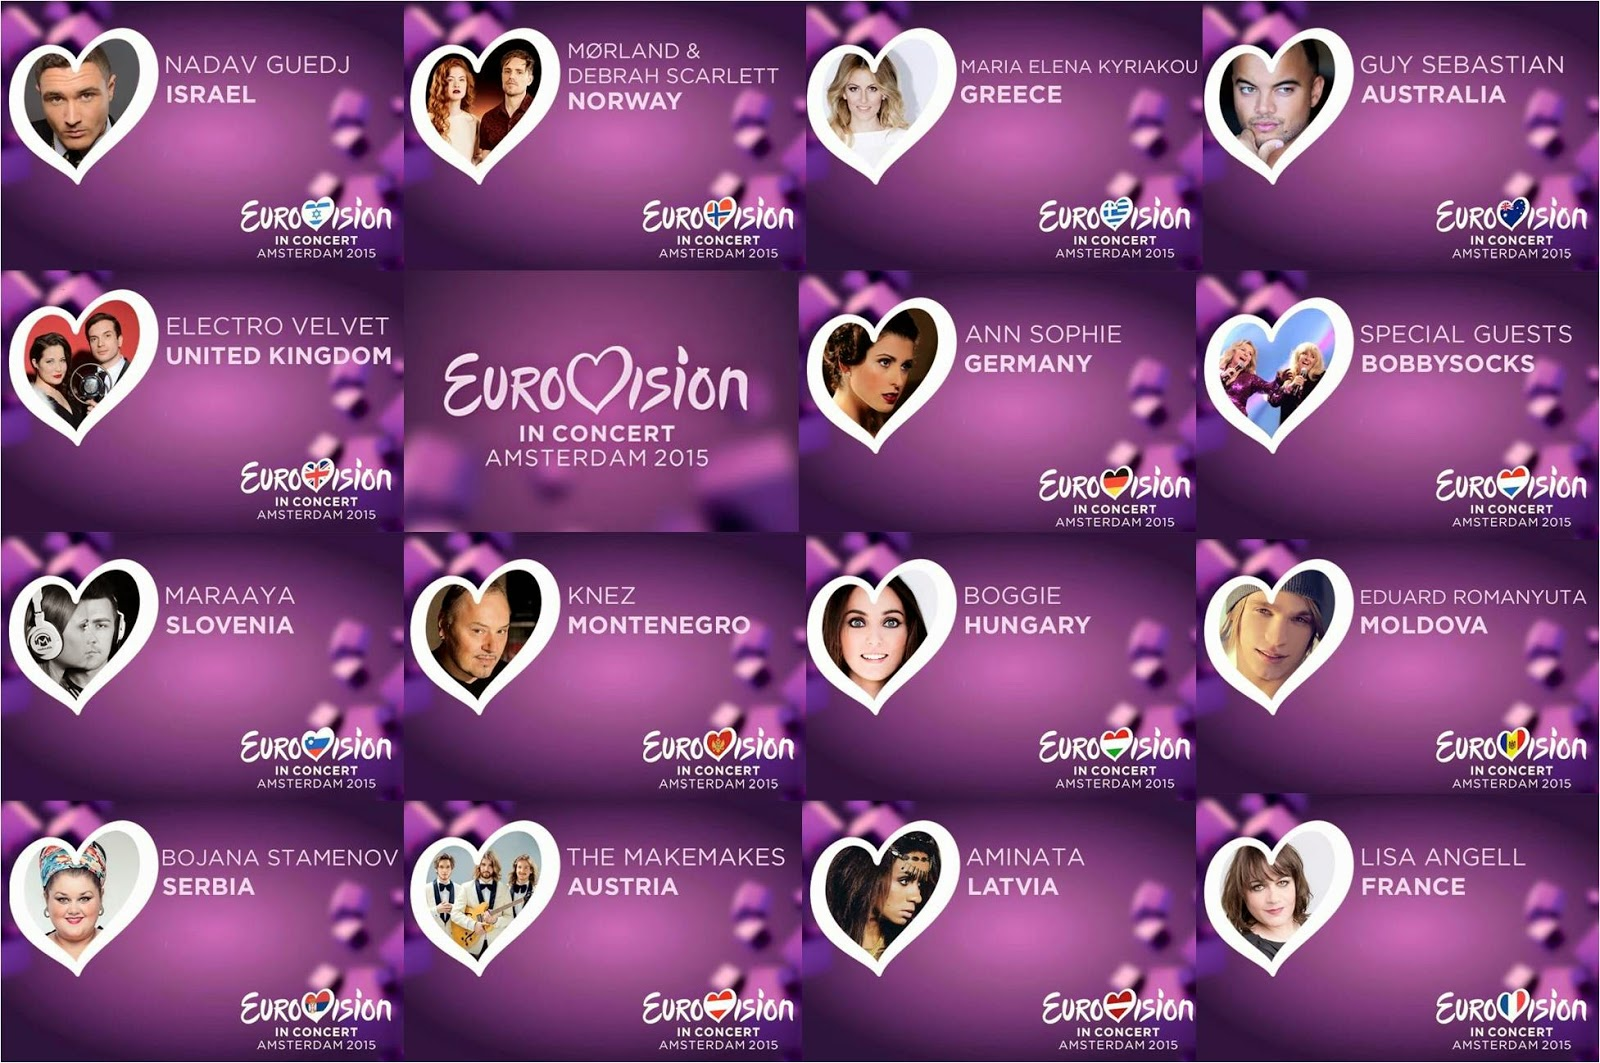 Eurovision in Concert 2015:Performances of Austria, Hungary,Latvia,UK,Slovenia,Montenegro